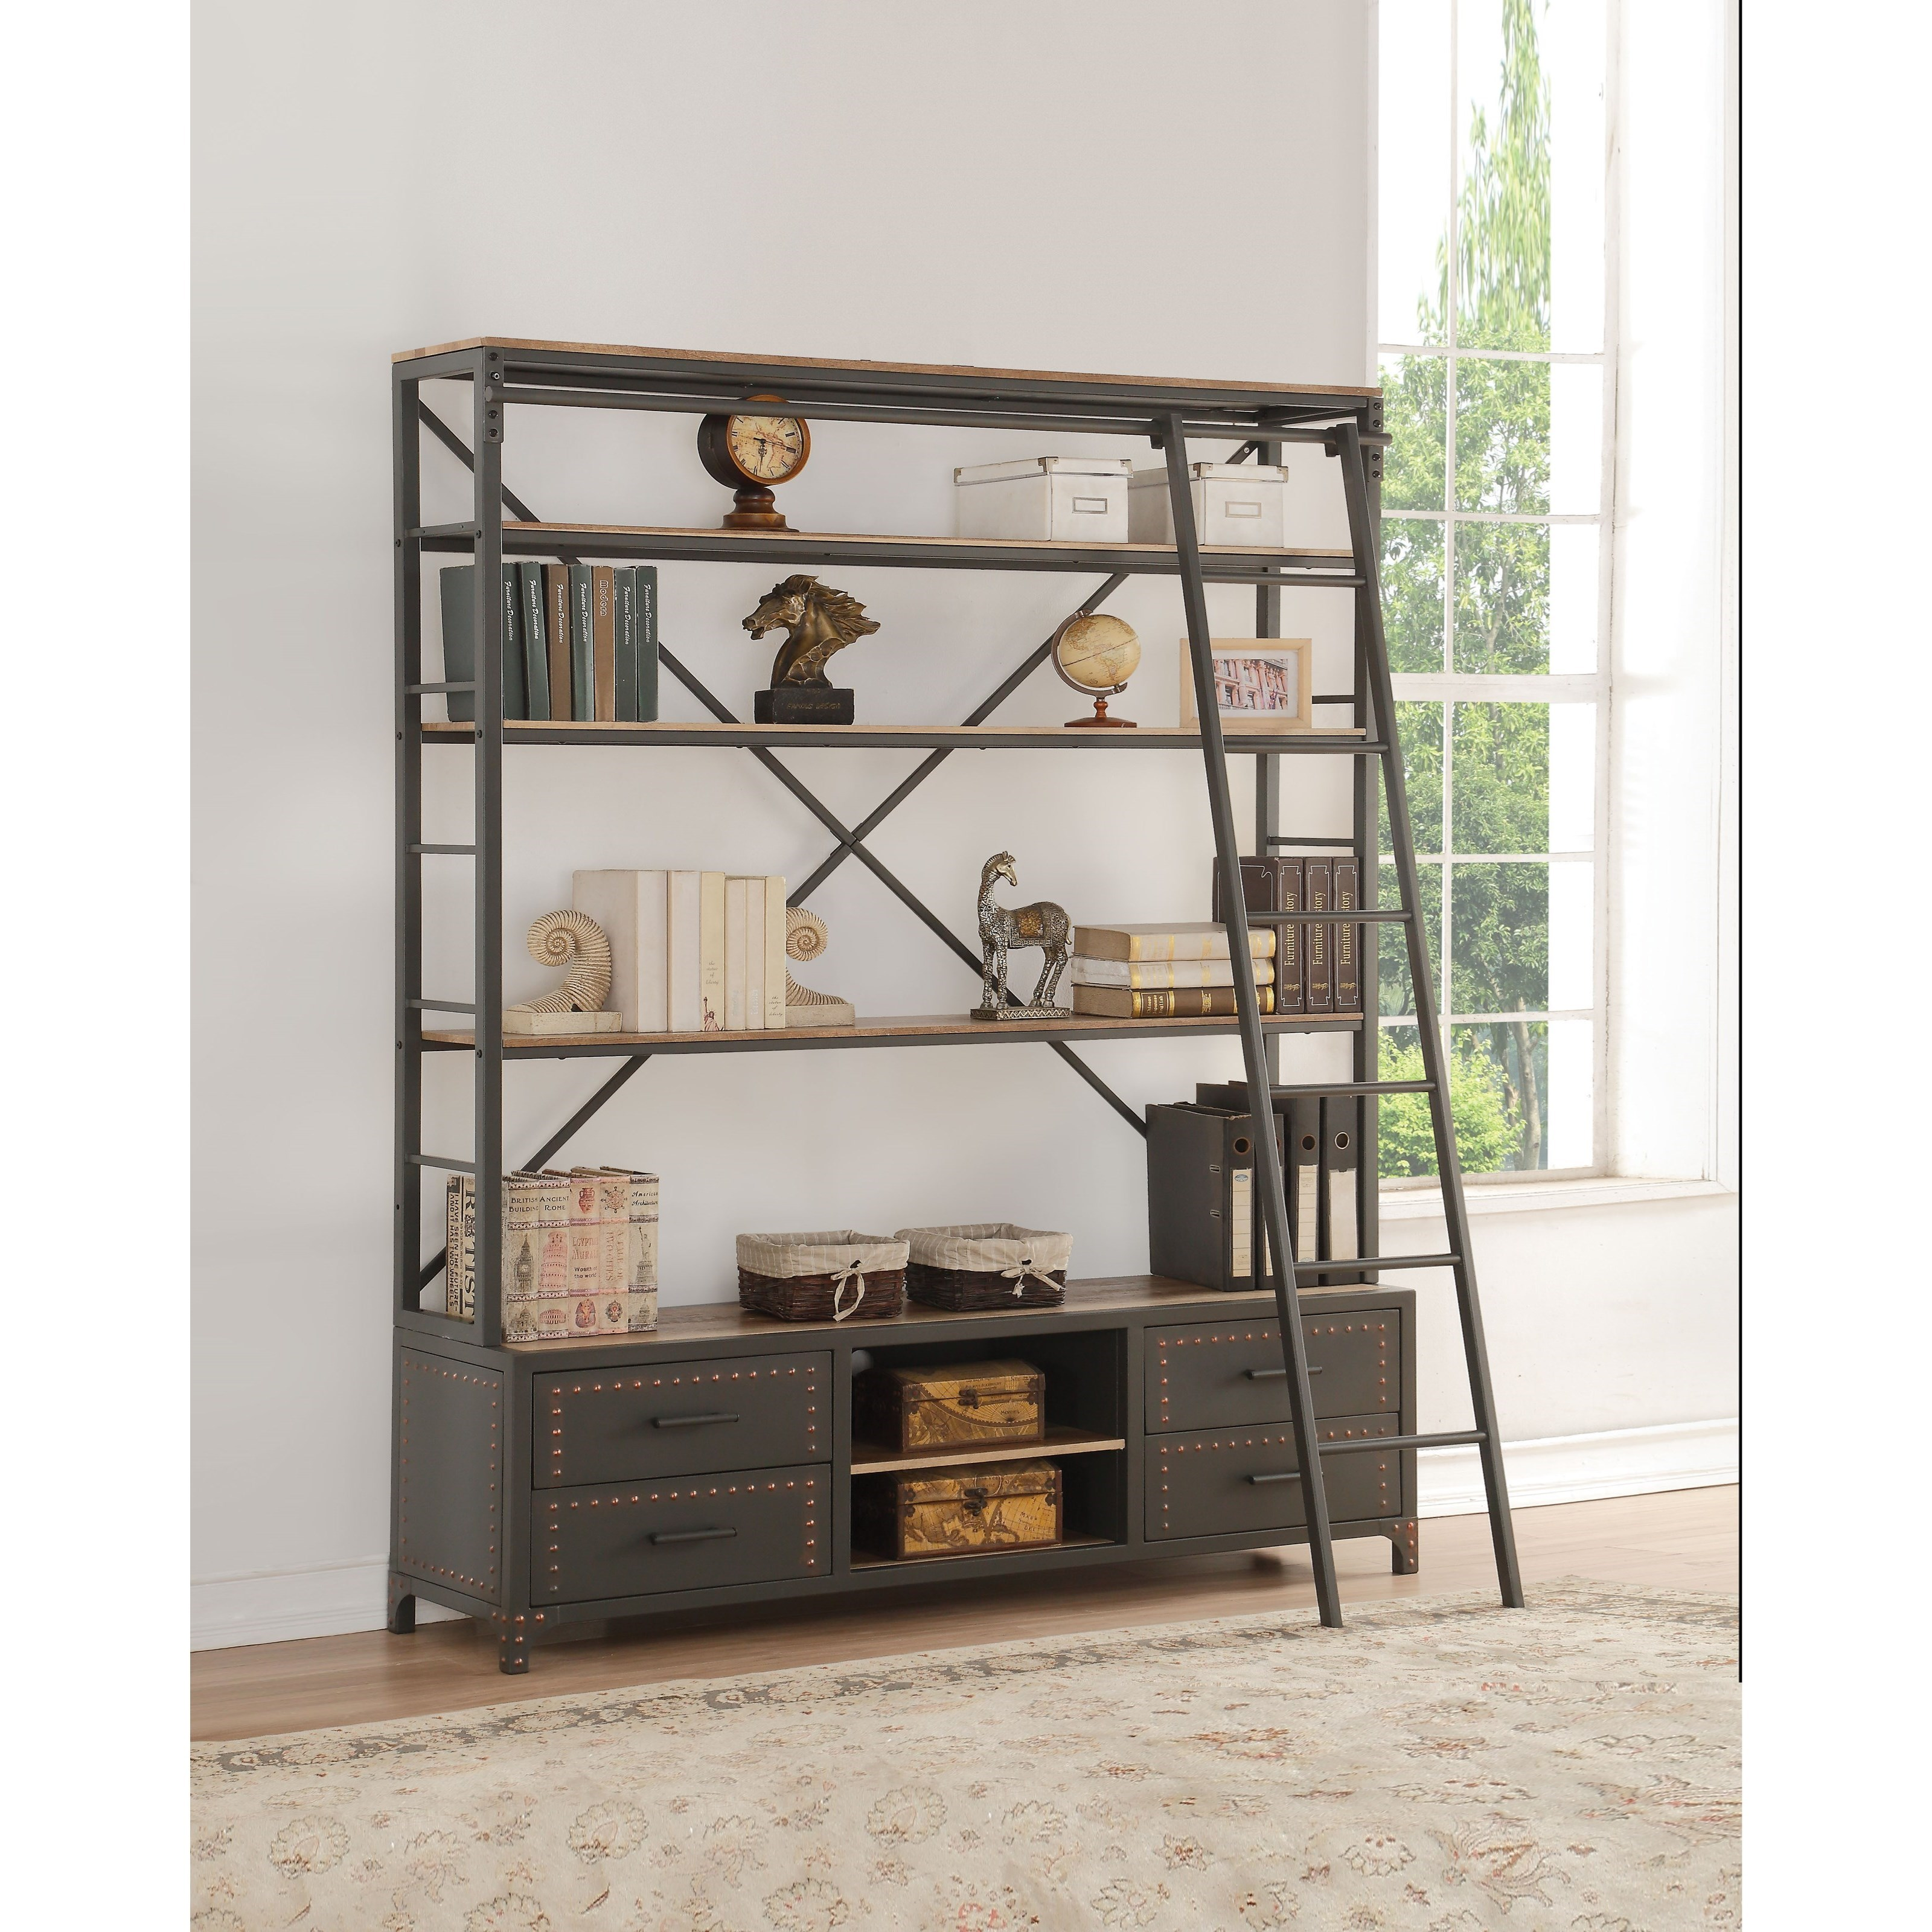 Actaki Bookshelf & Ladder by Acme Furniture at Carolina Direct